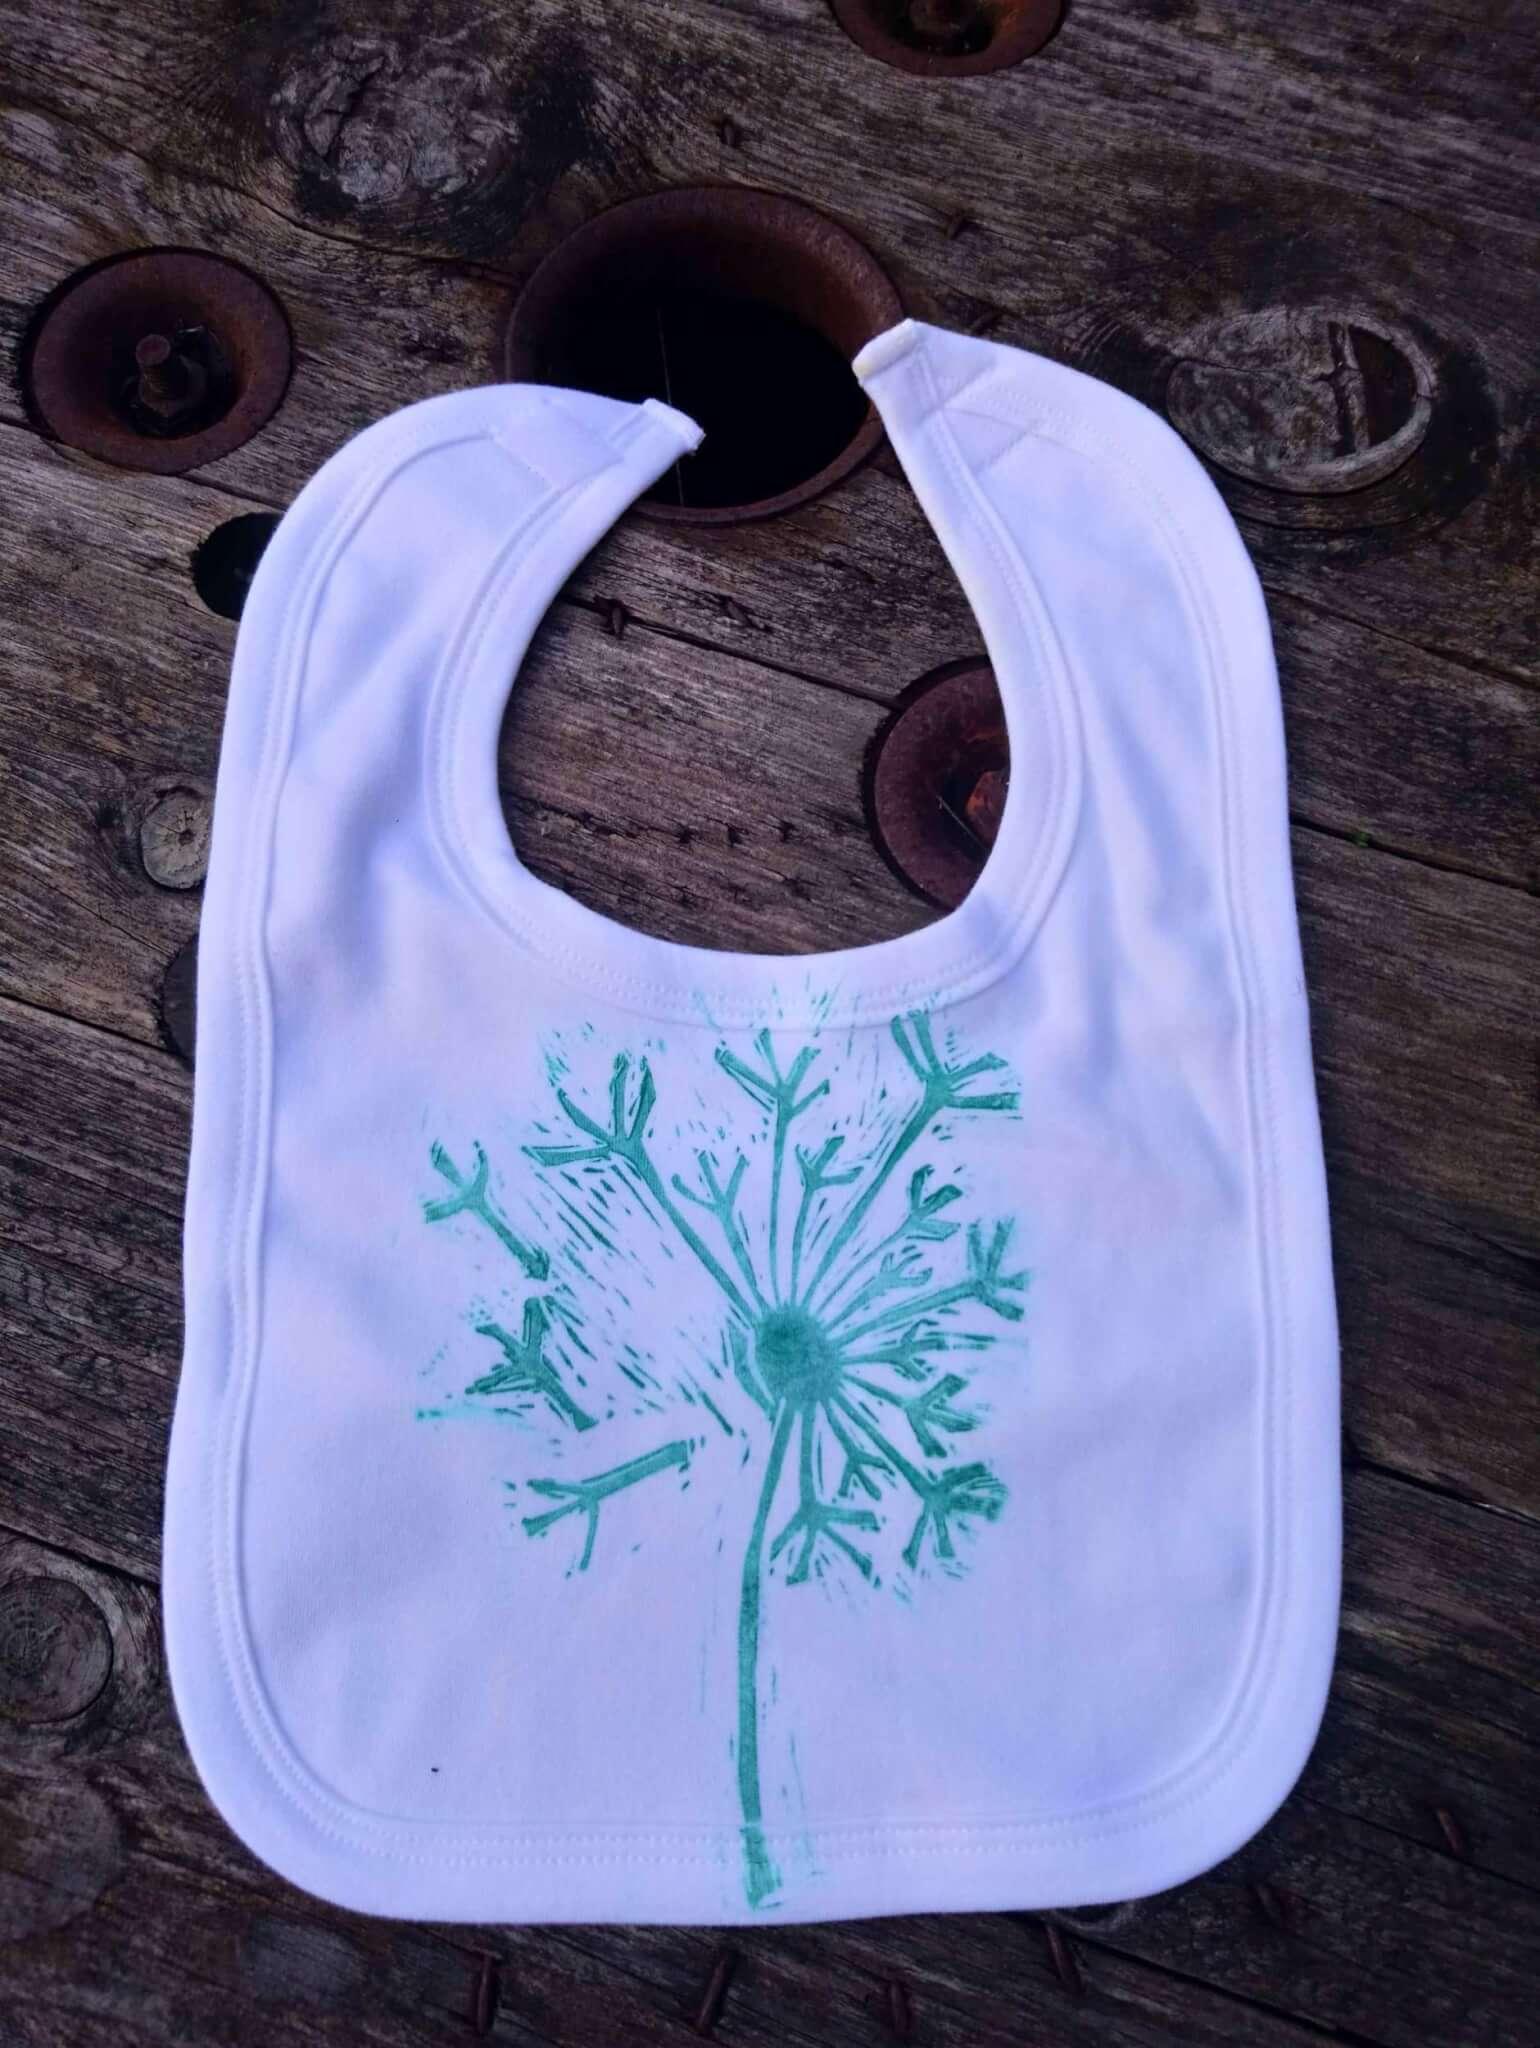 dandelion print baby bib